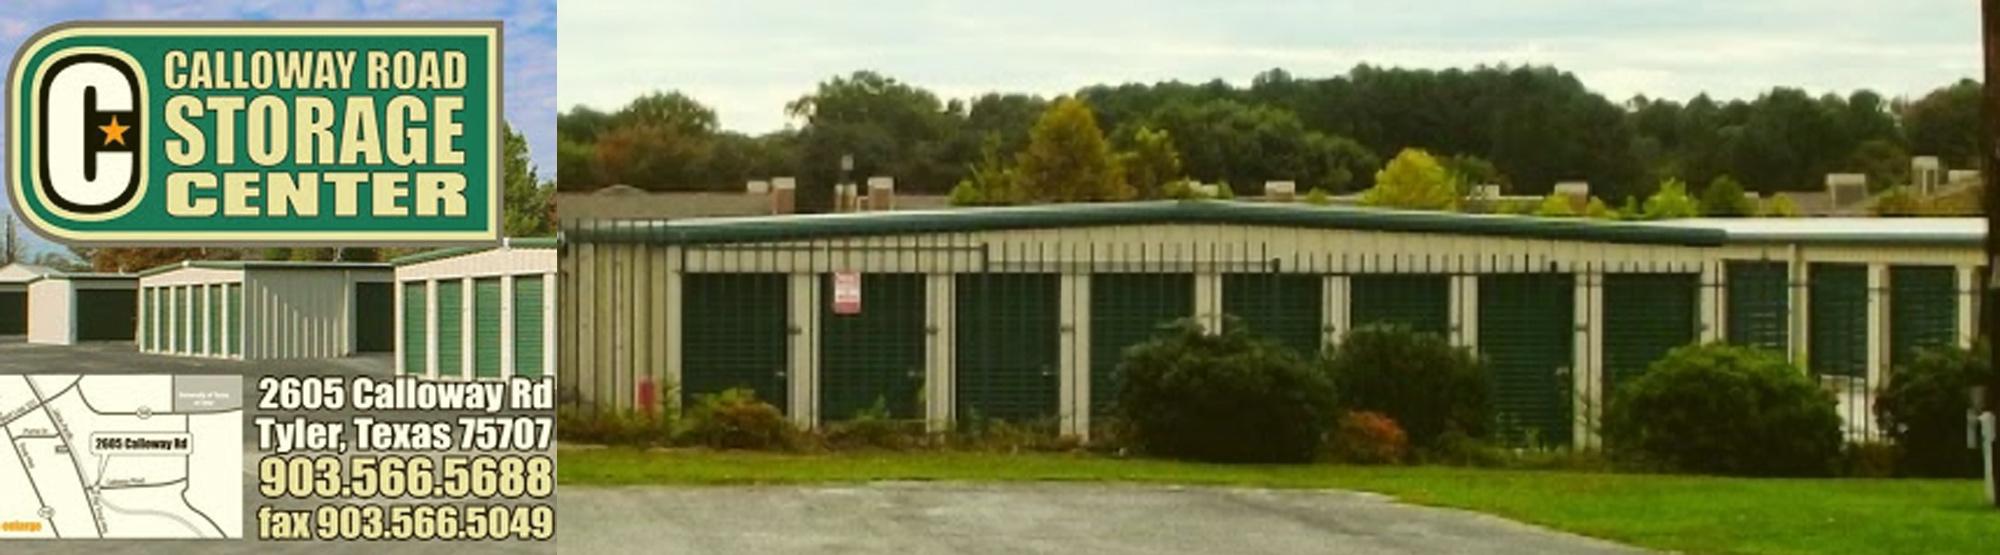 Calloway Road Storage